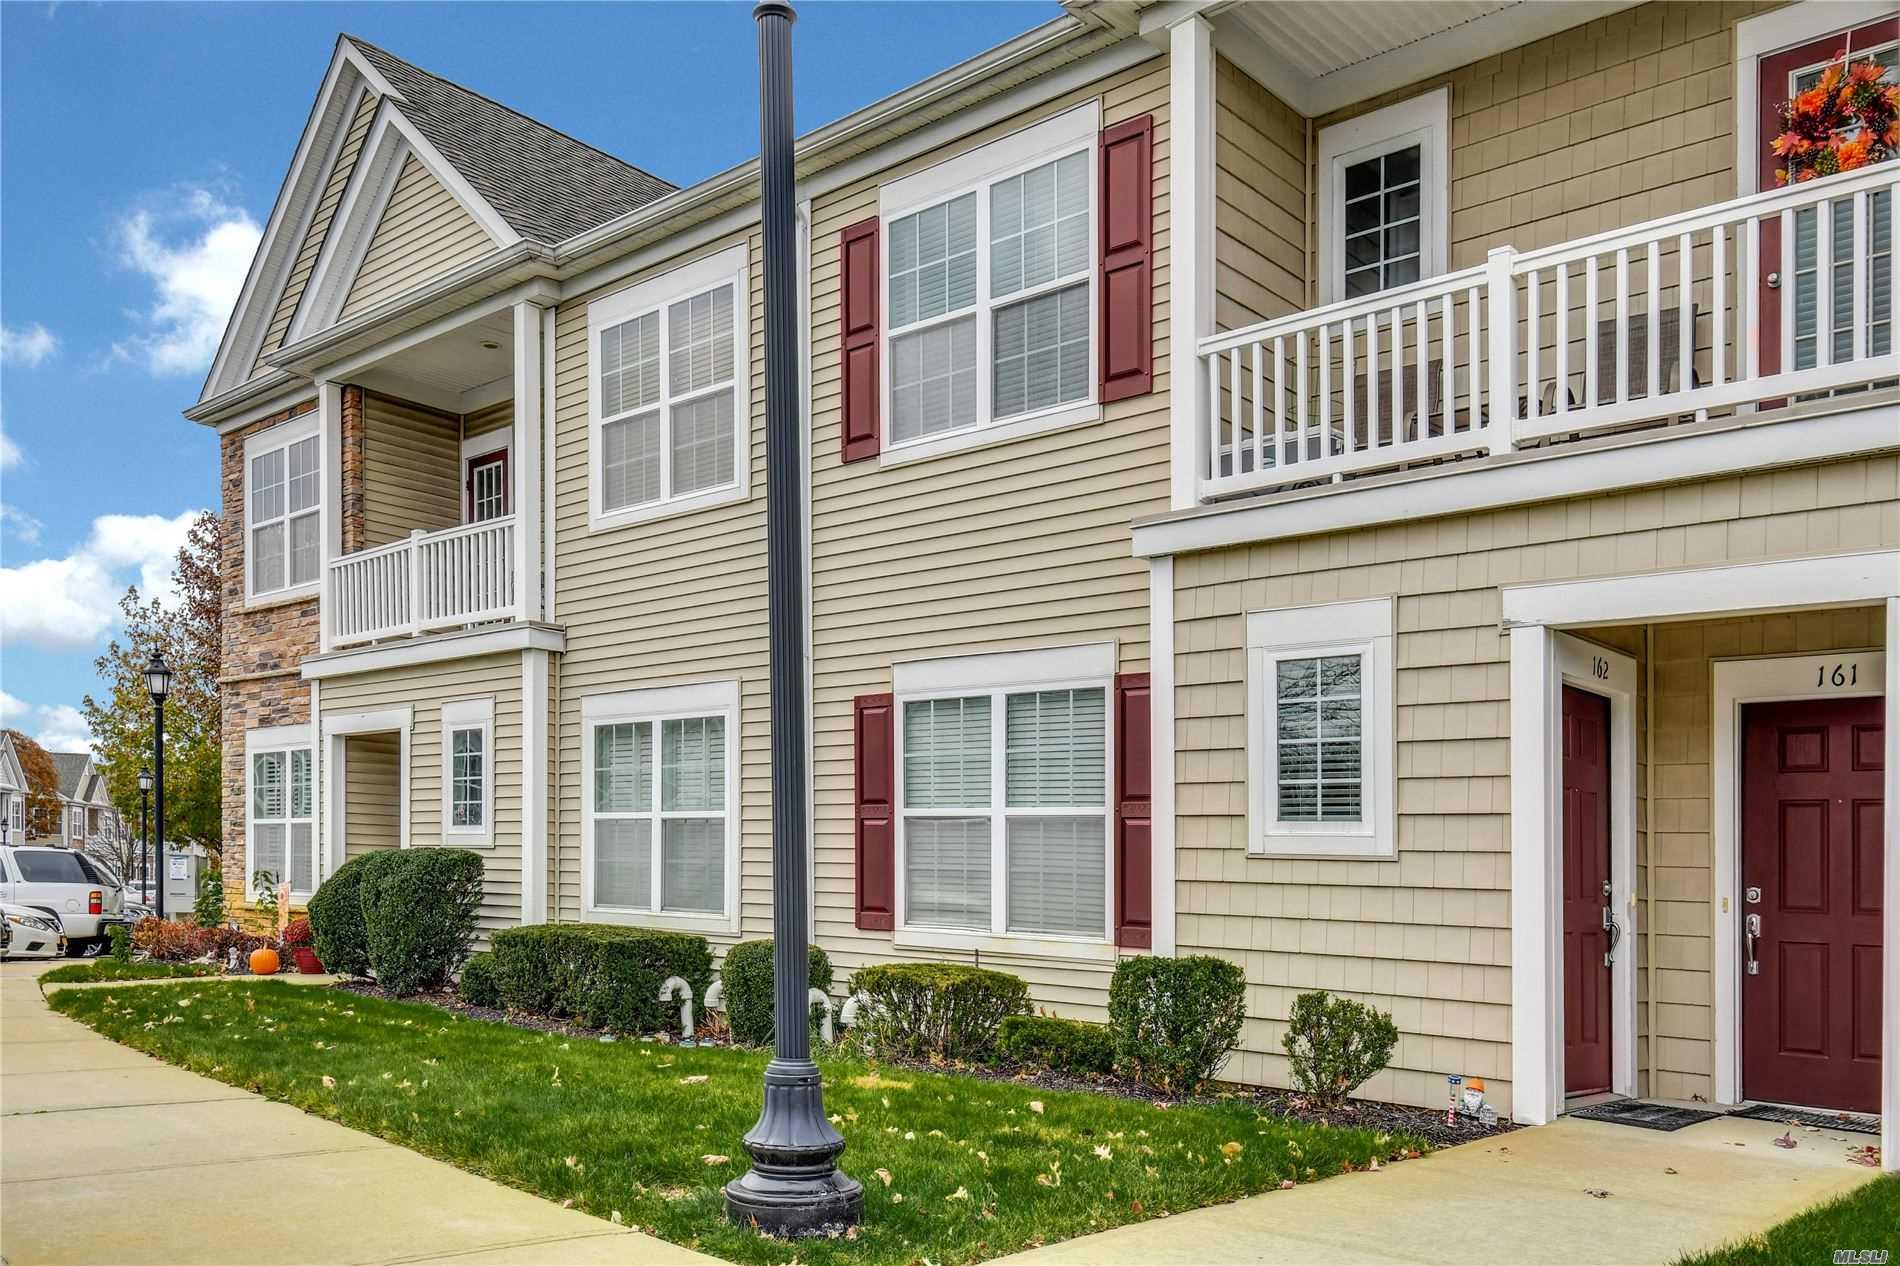 Property for sale at 162 Southampton Drive, Massapequa NY 11758, Massapequa,  New York 11758